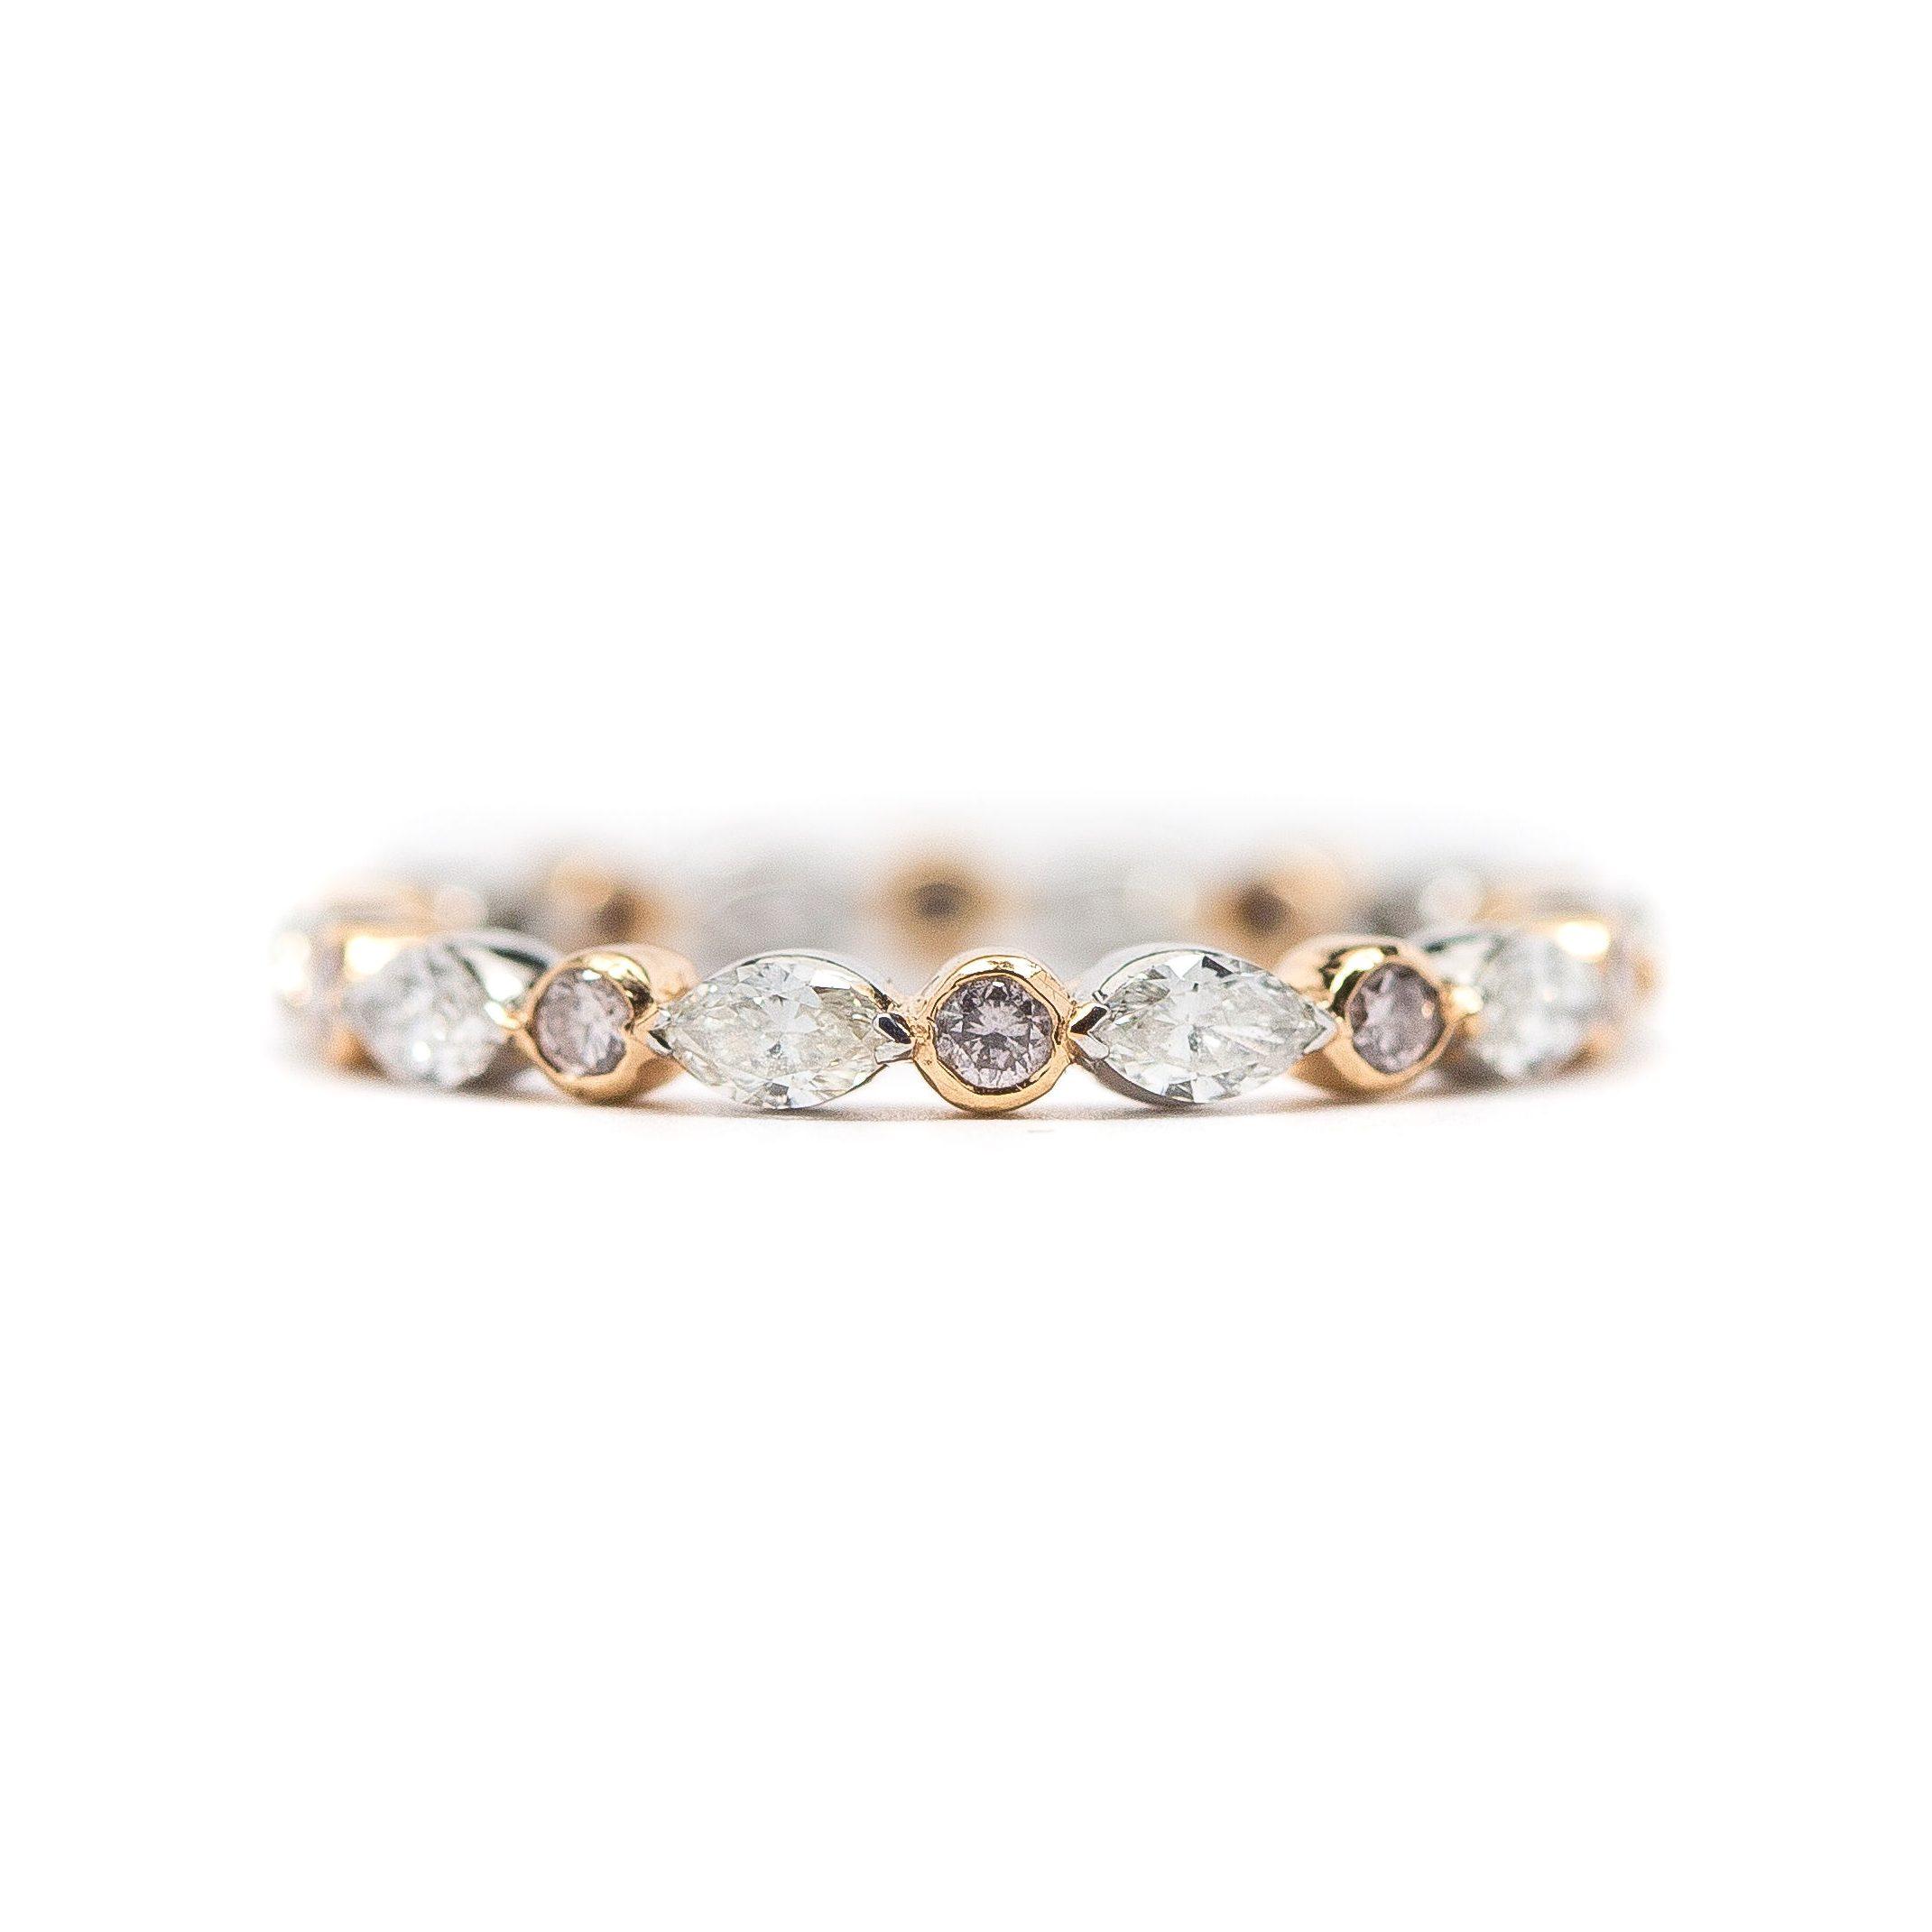 2fe627ba6 Miriams Jewelry Alternating Round And Marquise Diamond Eternity Band